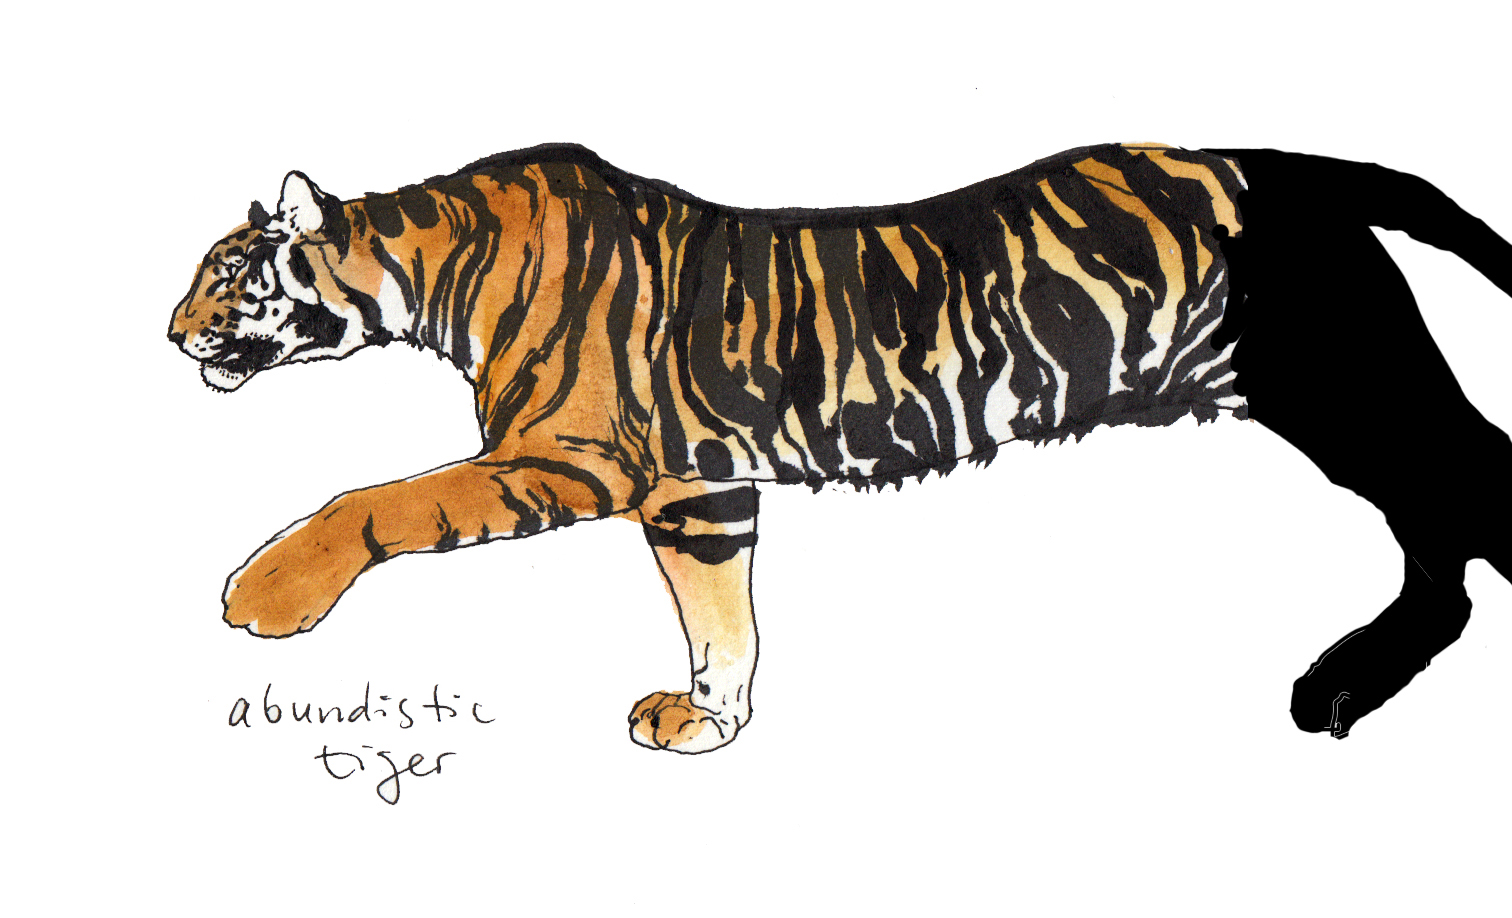 abundistic tiger